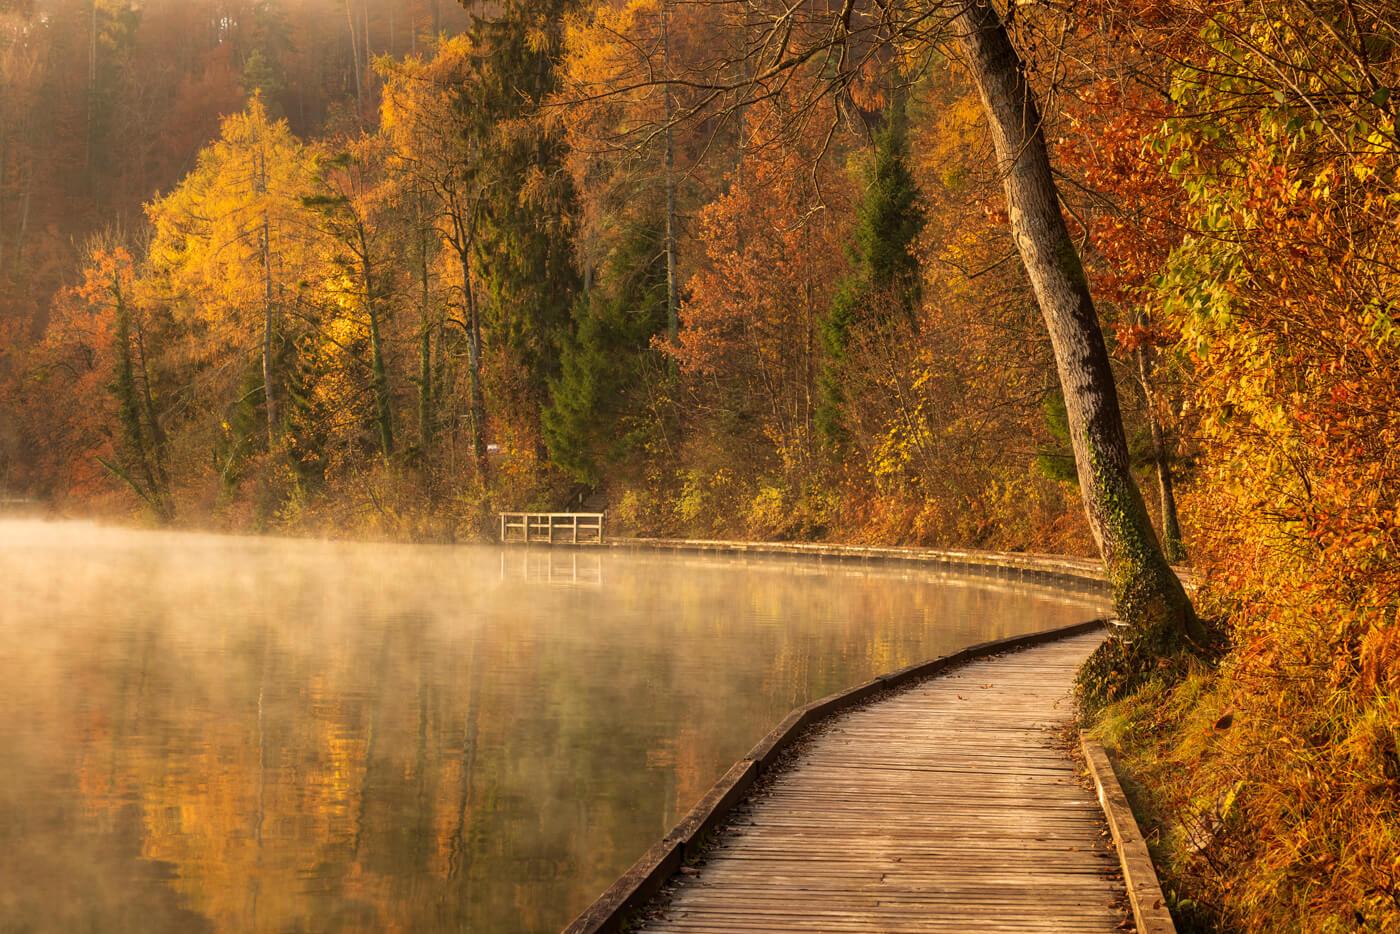 Autmn Gold, Lake Bled, Slovenia